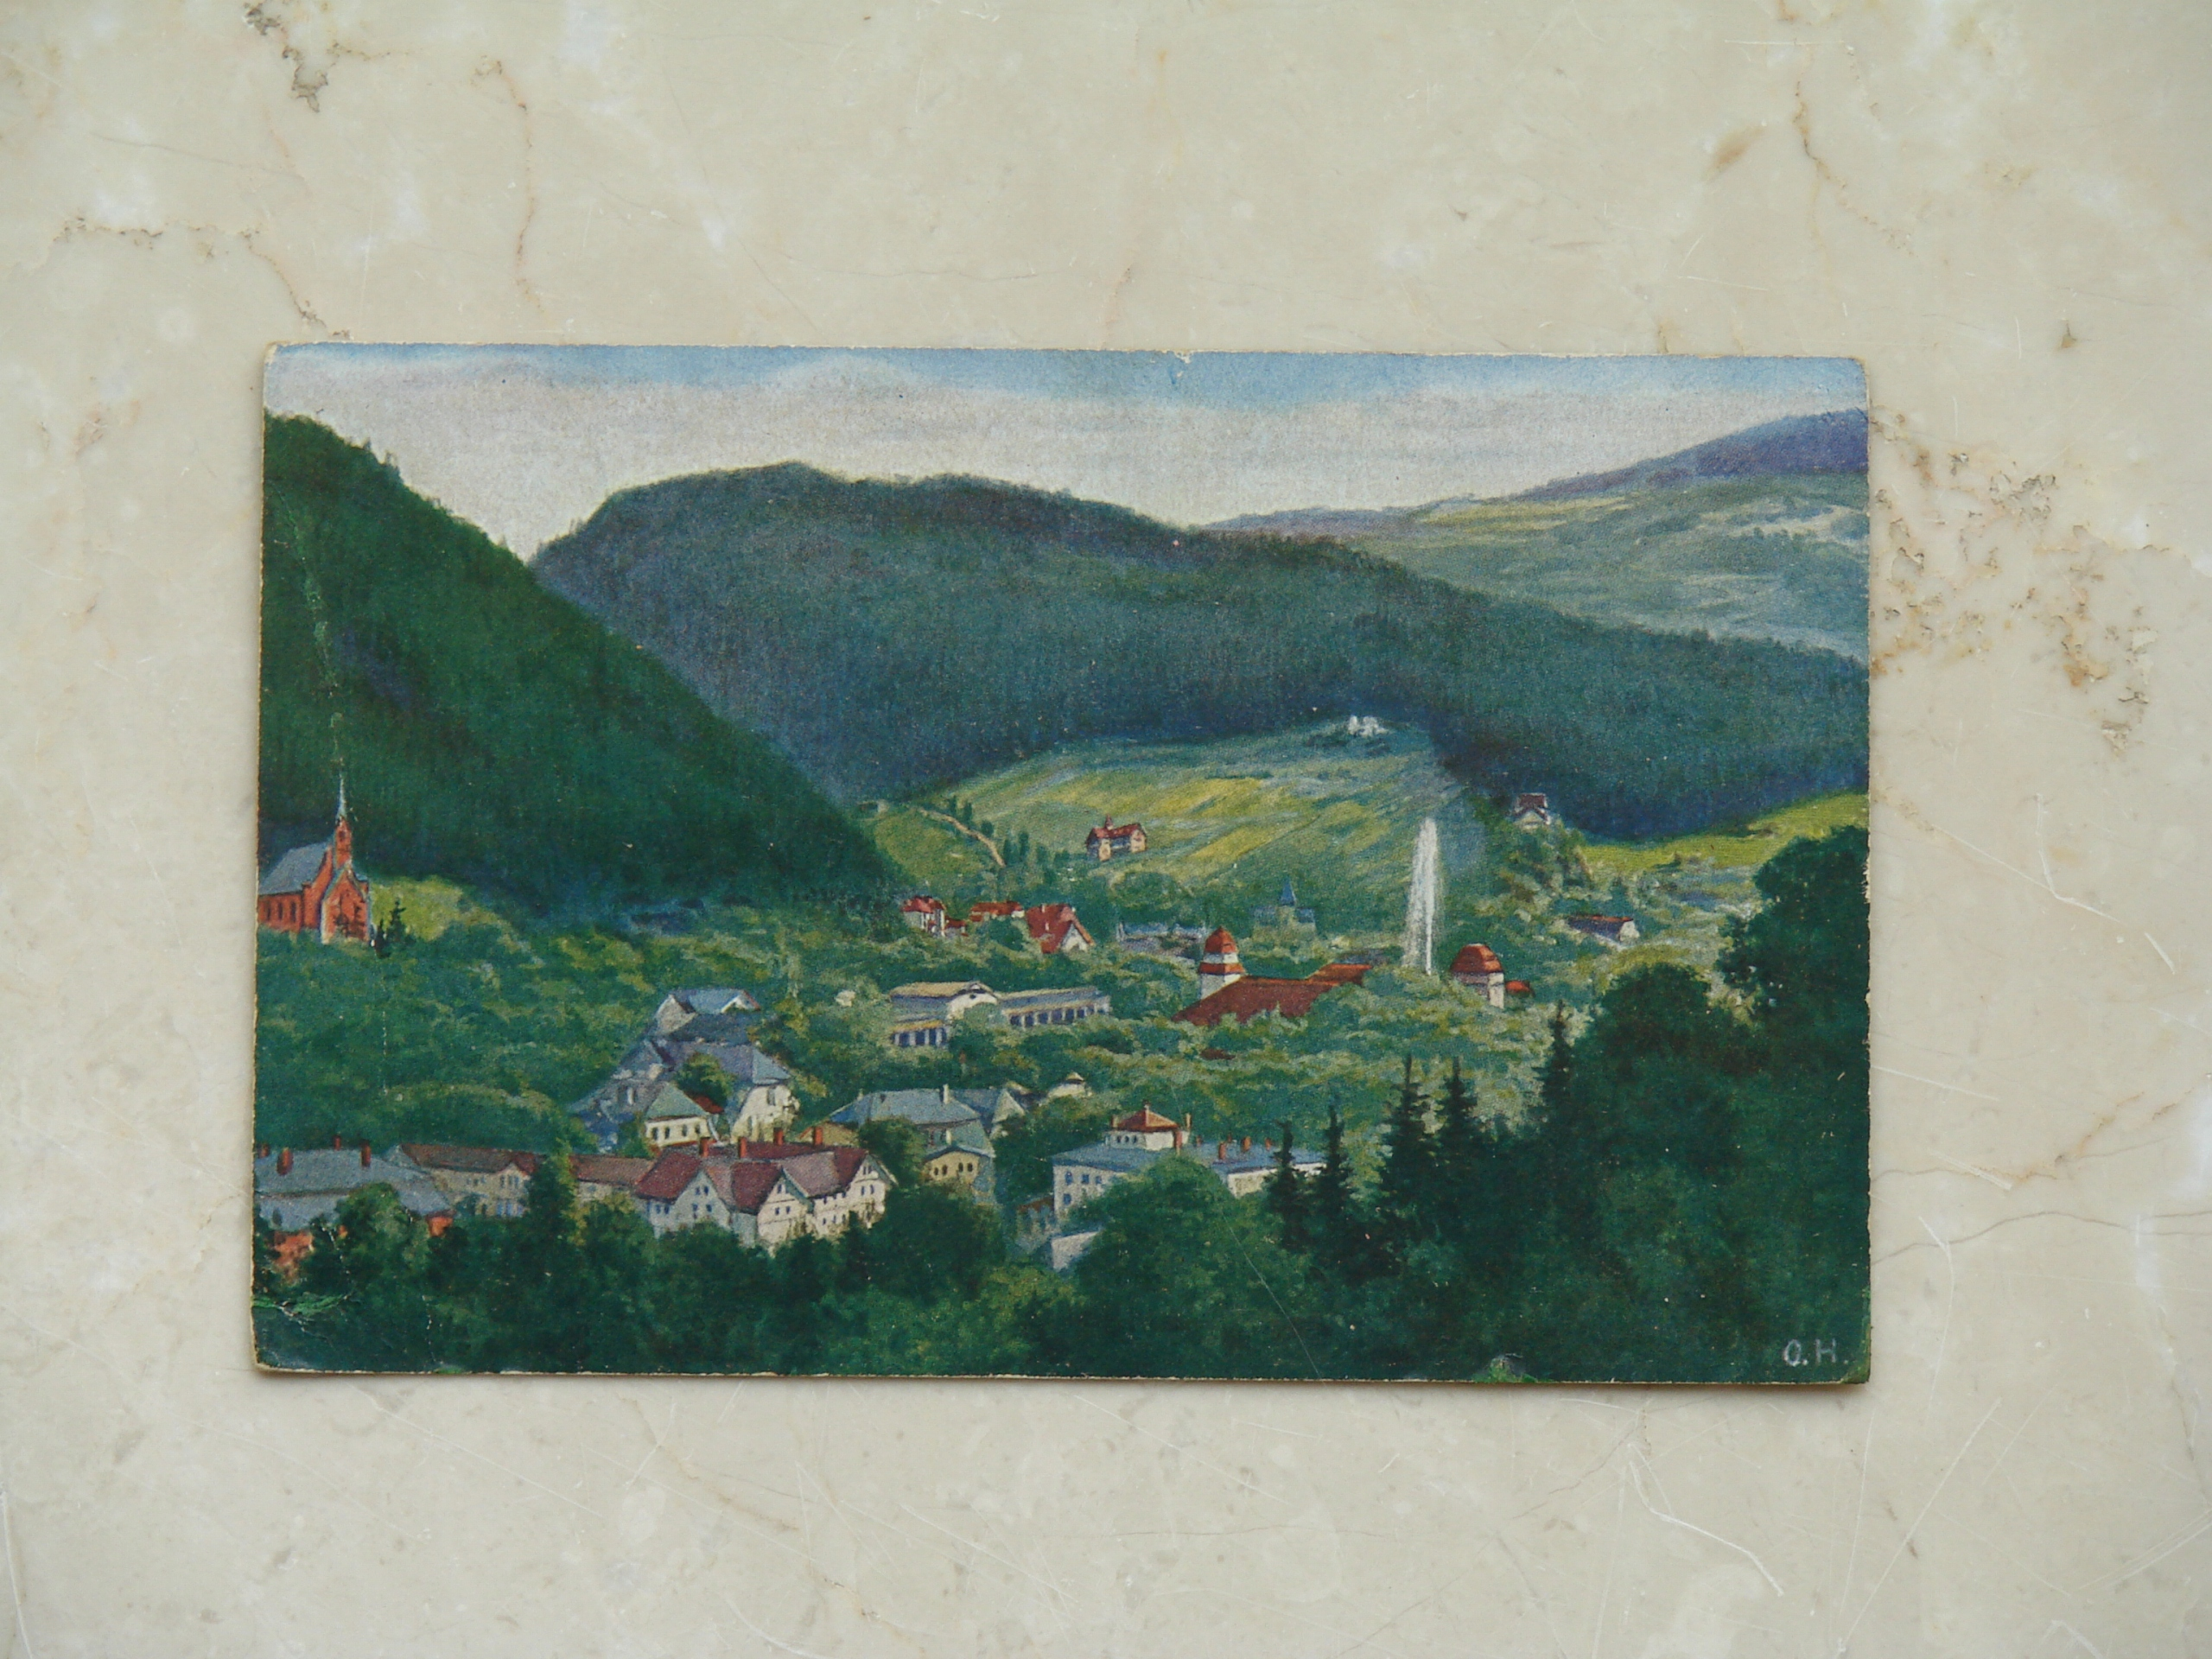 Bad Reinerz, Glatz - Akwarela O. Herrfurth